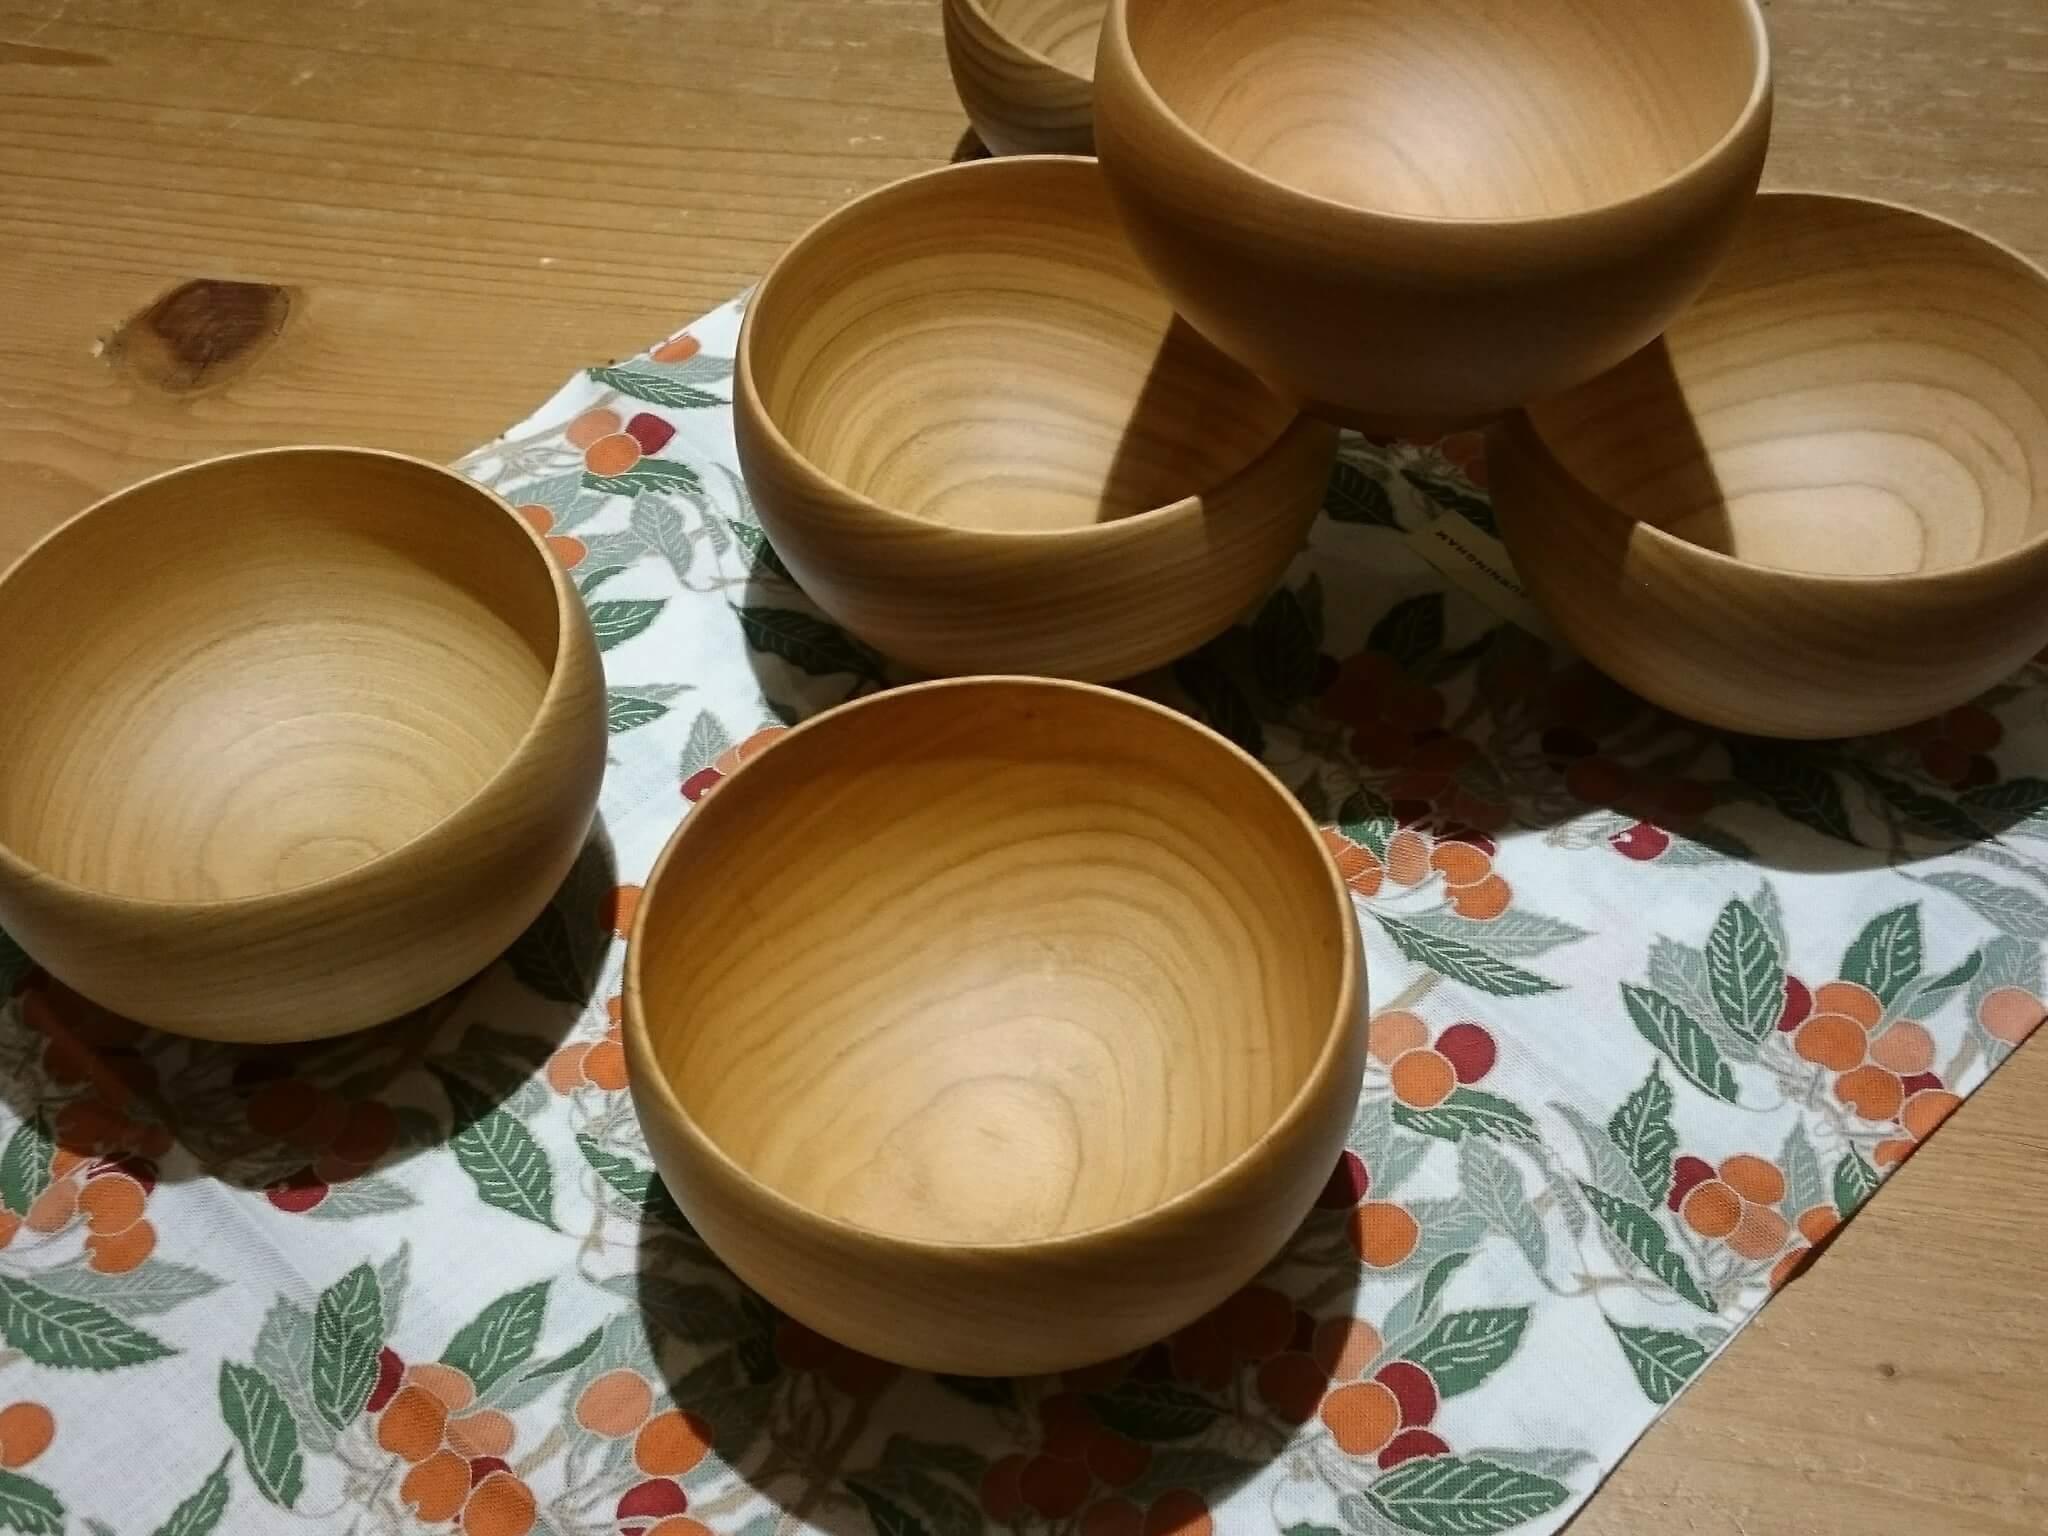 Cherry tree bowl MEIBOKU-WAN 桜の木で作られためいぼく椀